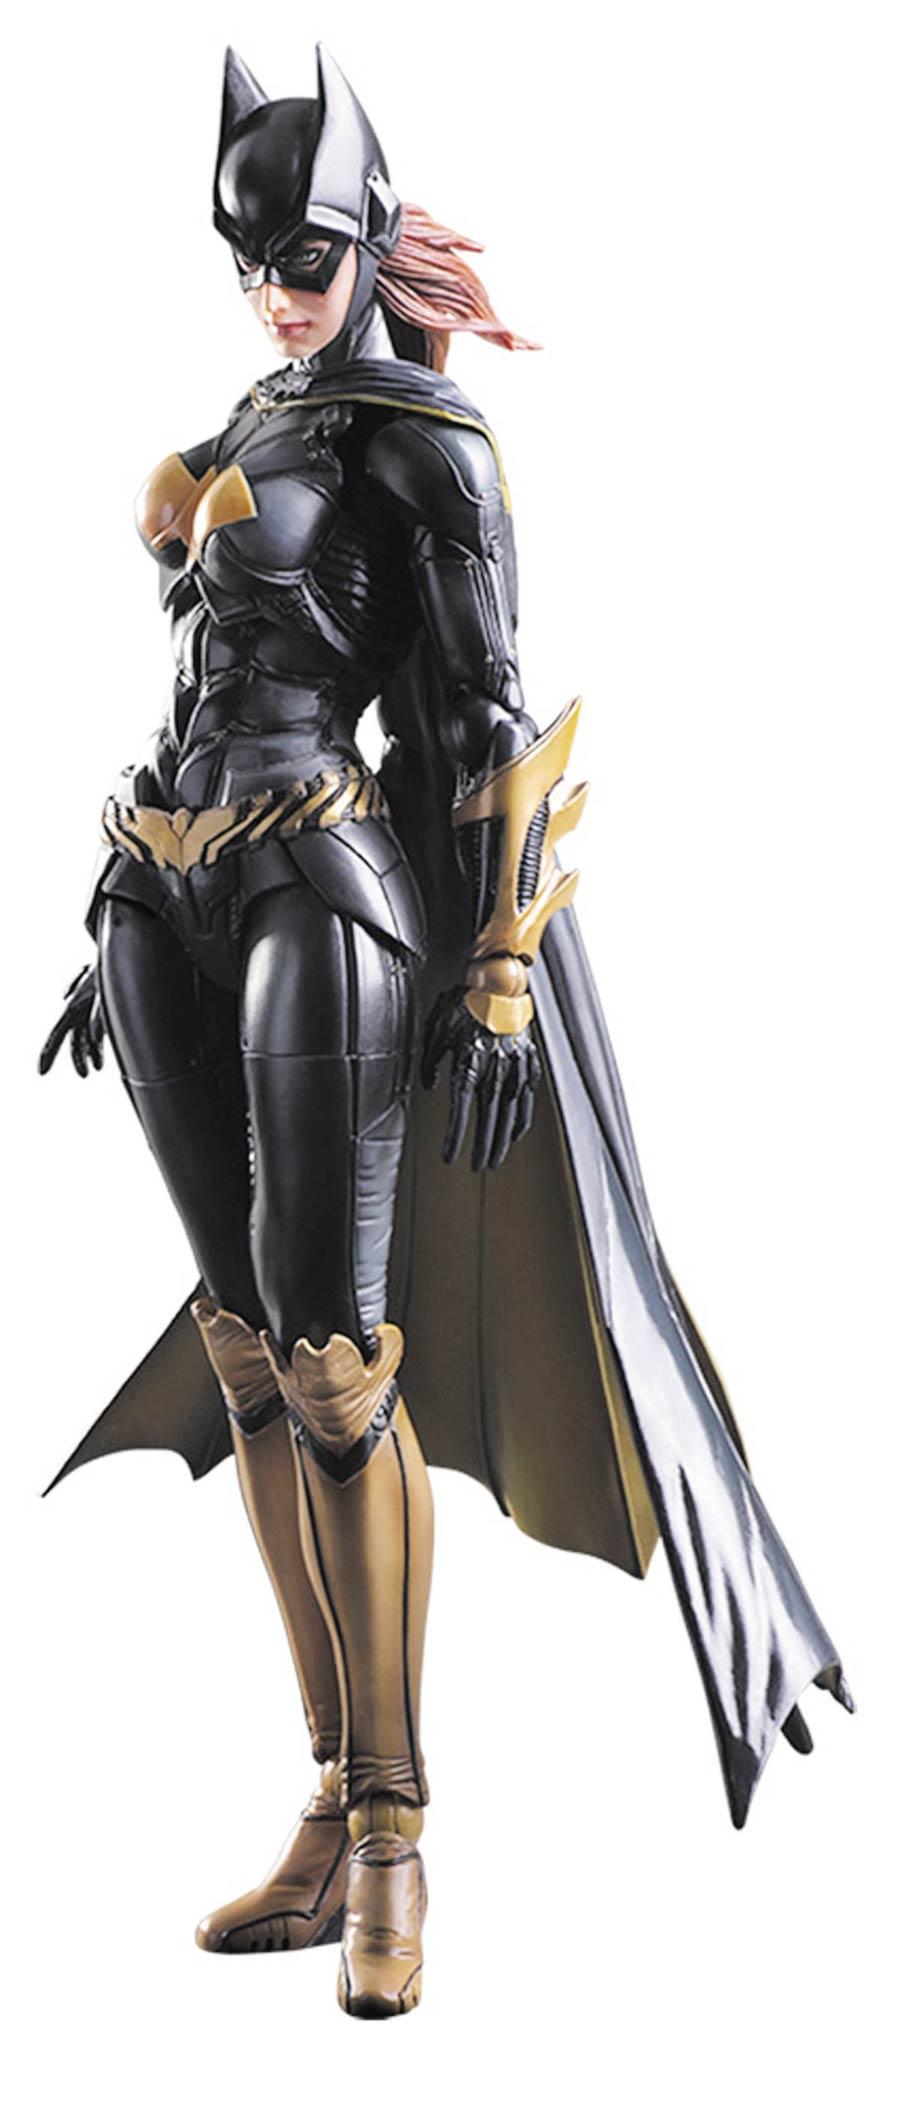 Batman Arkham Knight Play Arts Kai Action Figure - Batgirl